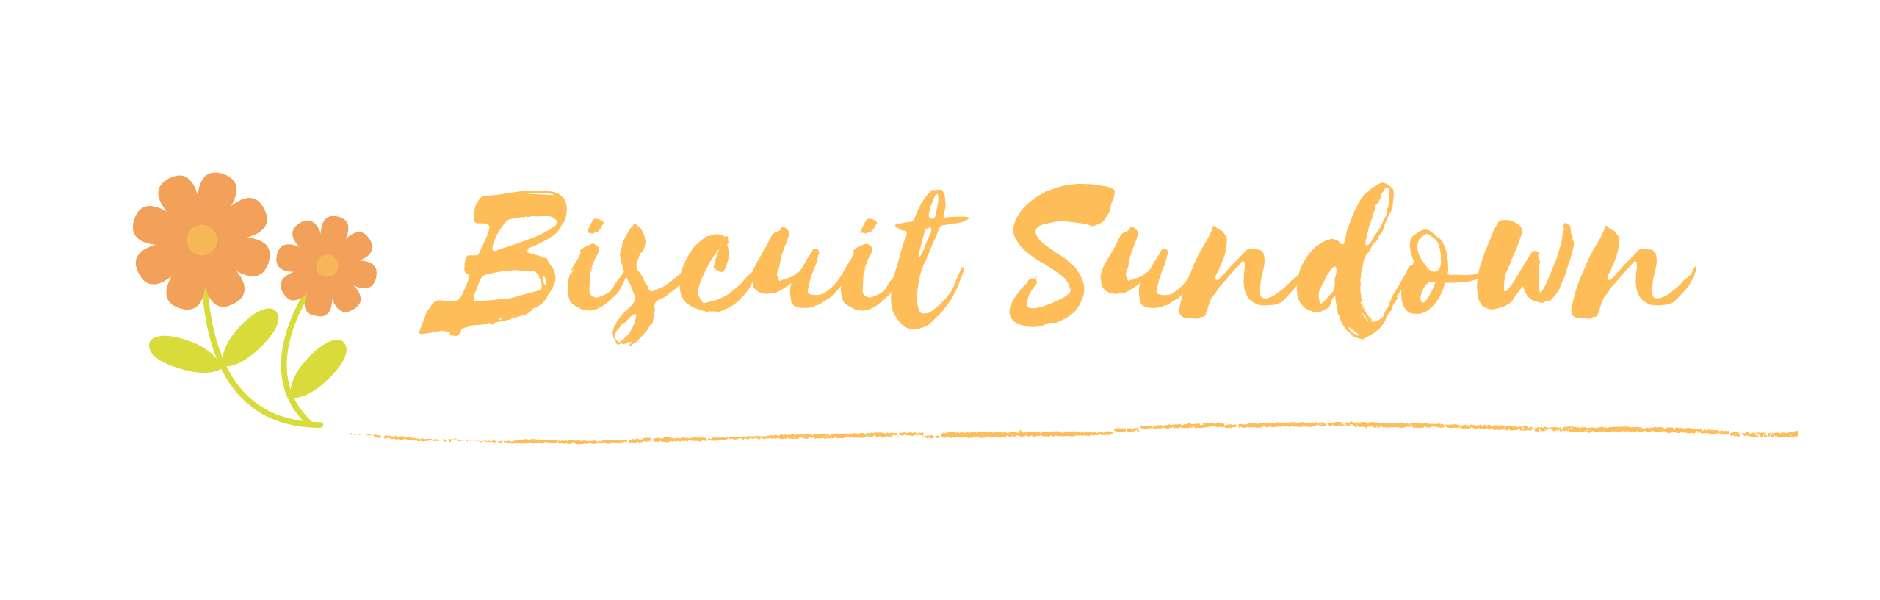 Biscuit Sundown